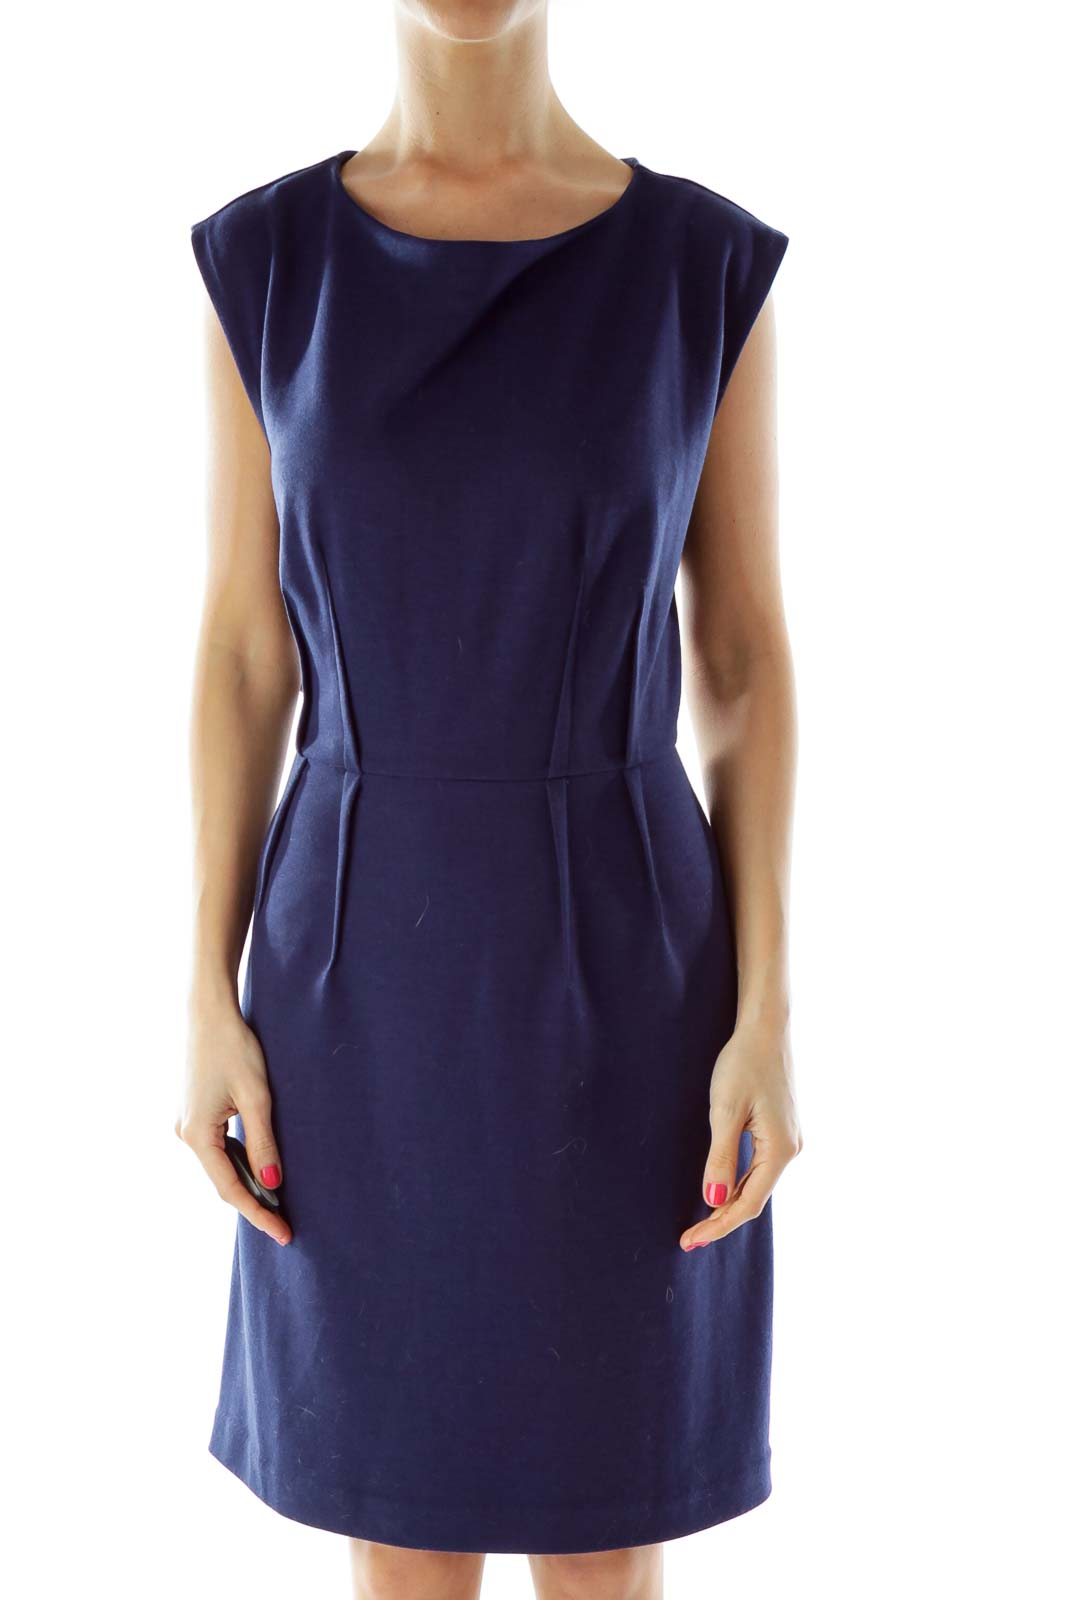 Navy Round Neck Sleeveless Work Dress